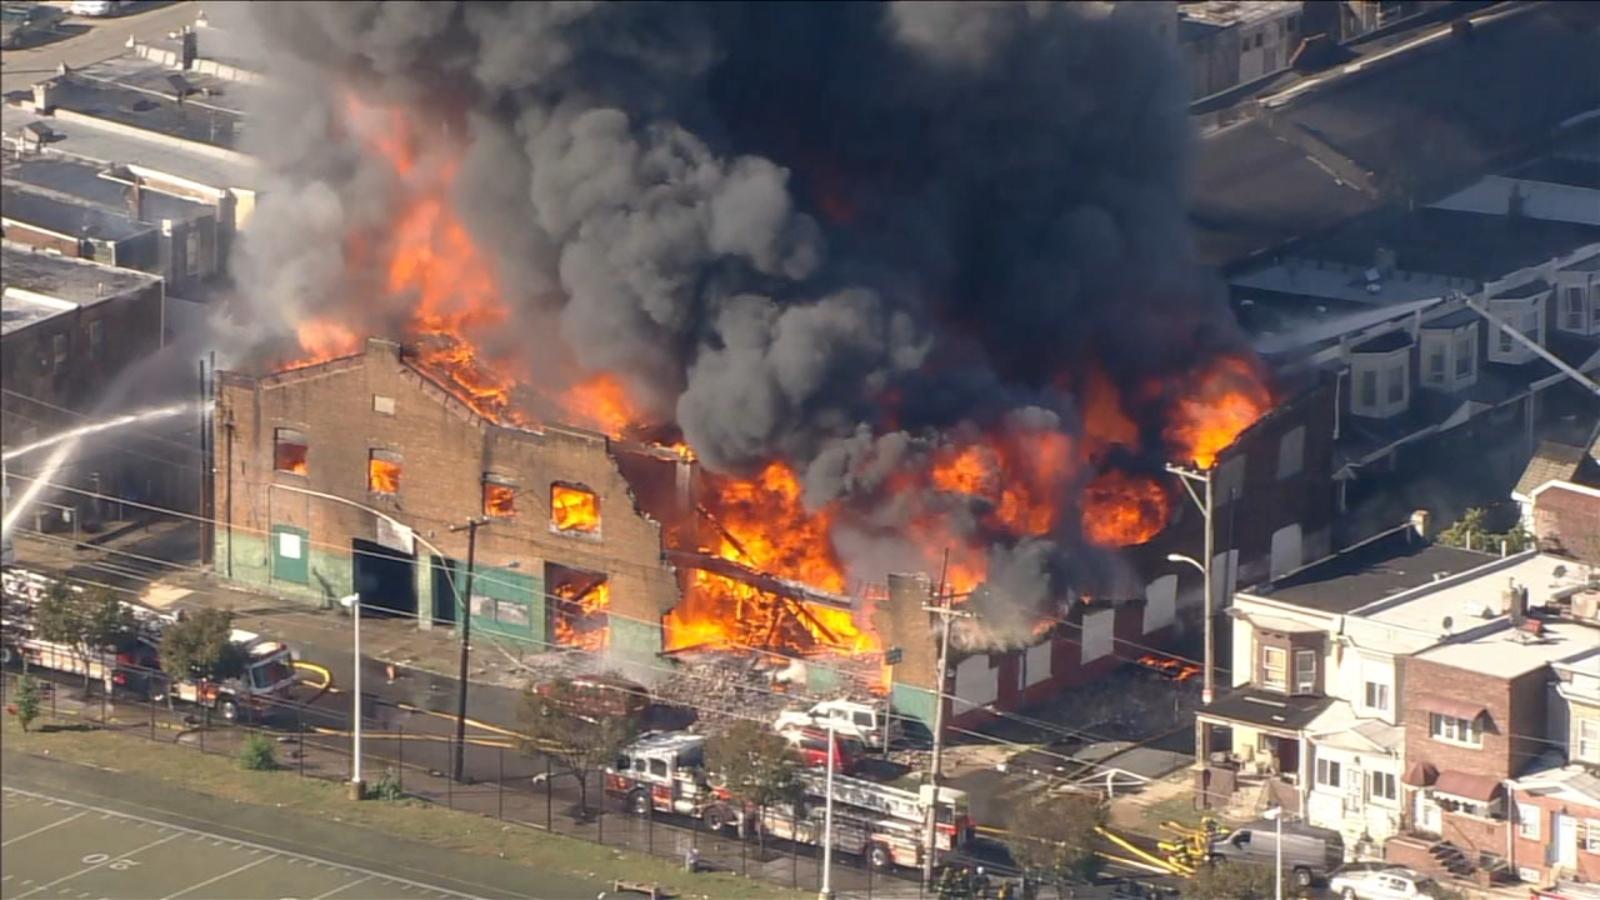 Philadelphia firefighters battling massive blaze at auto body shop in Cobbs Creek